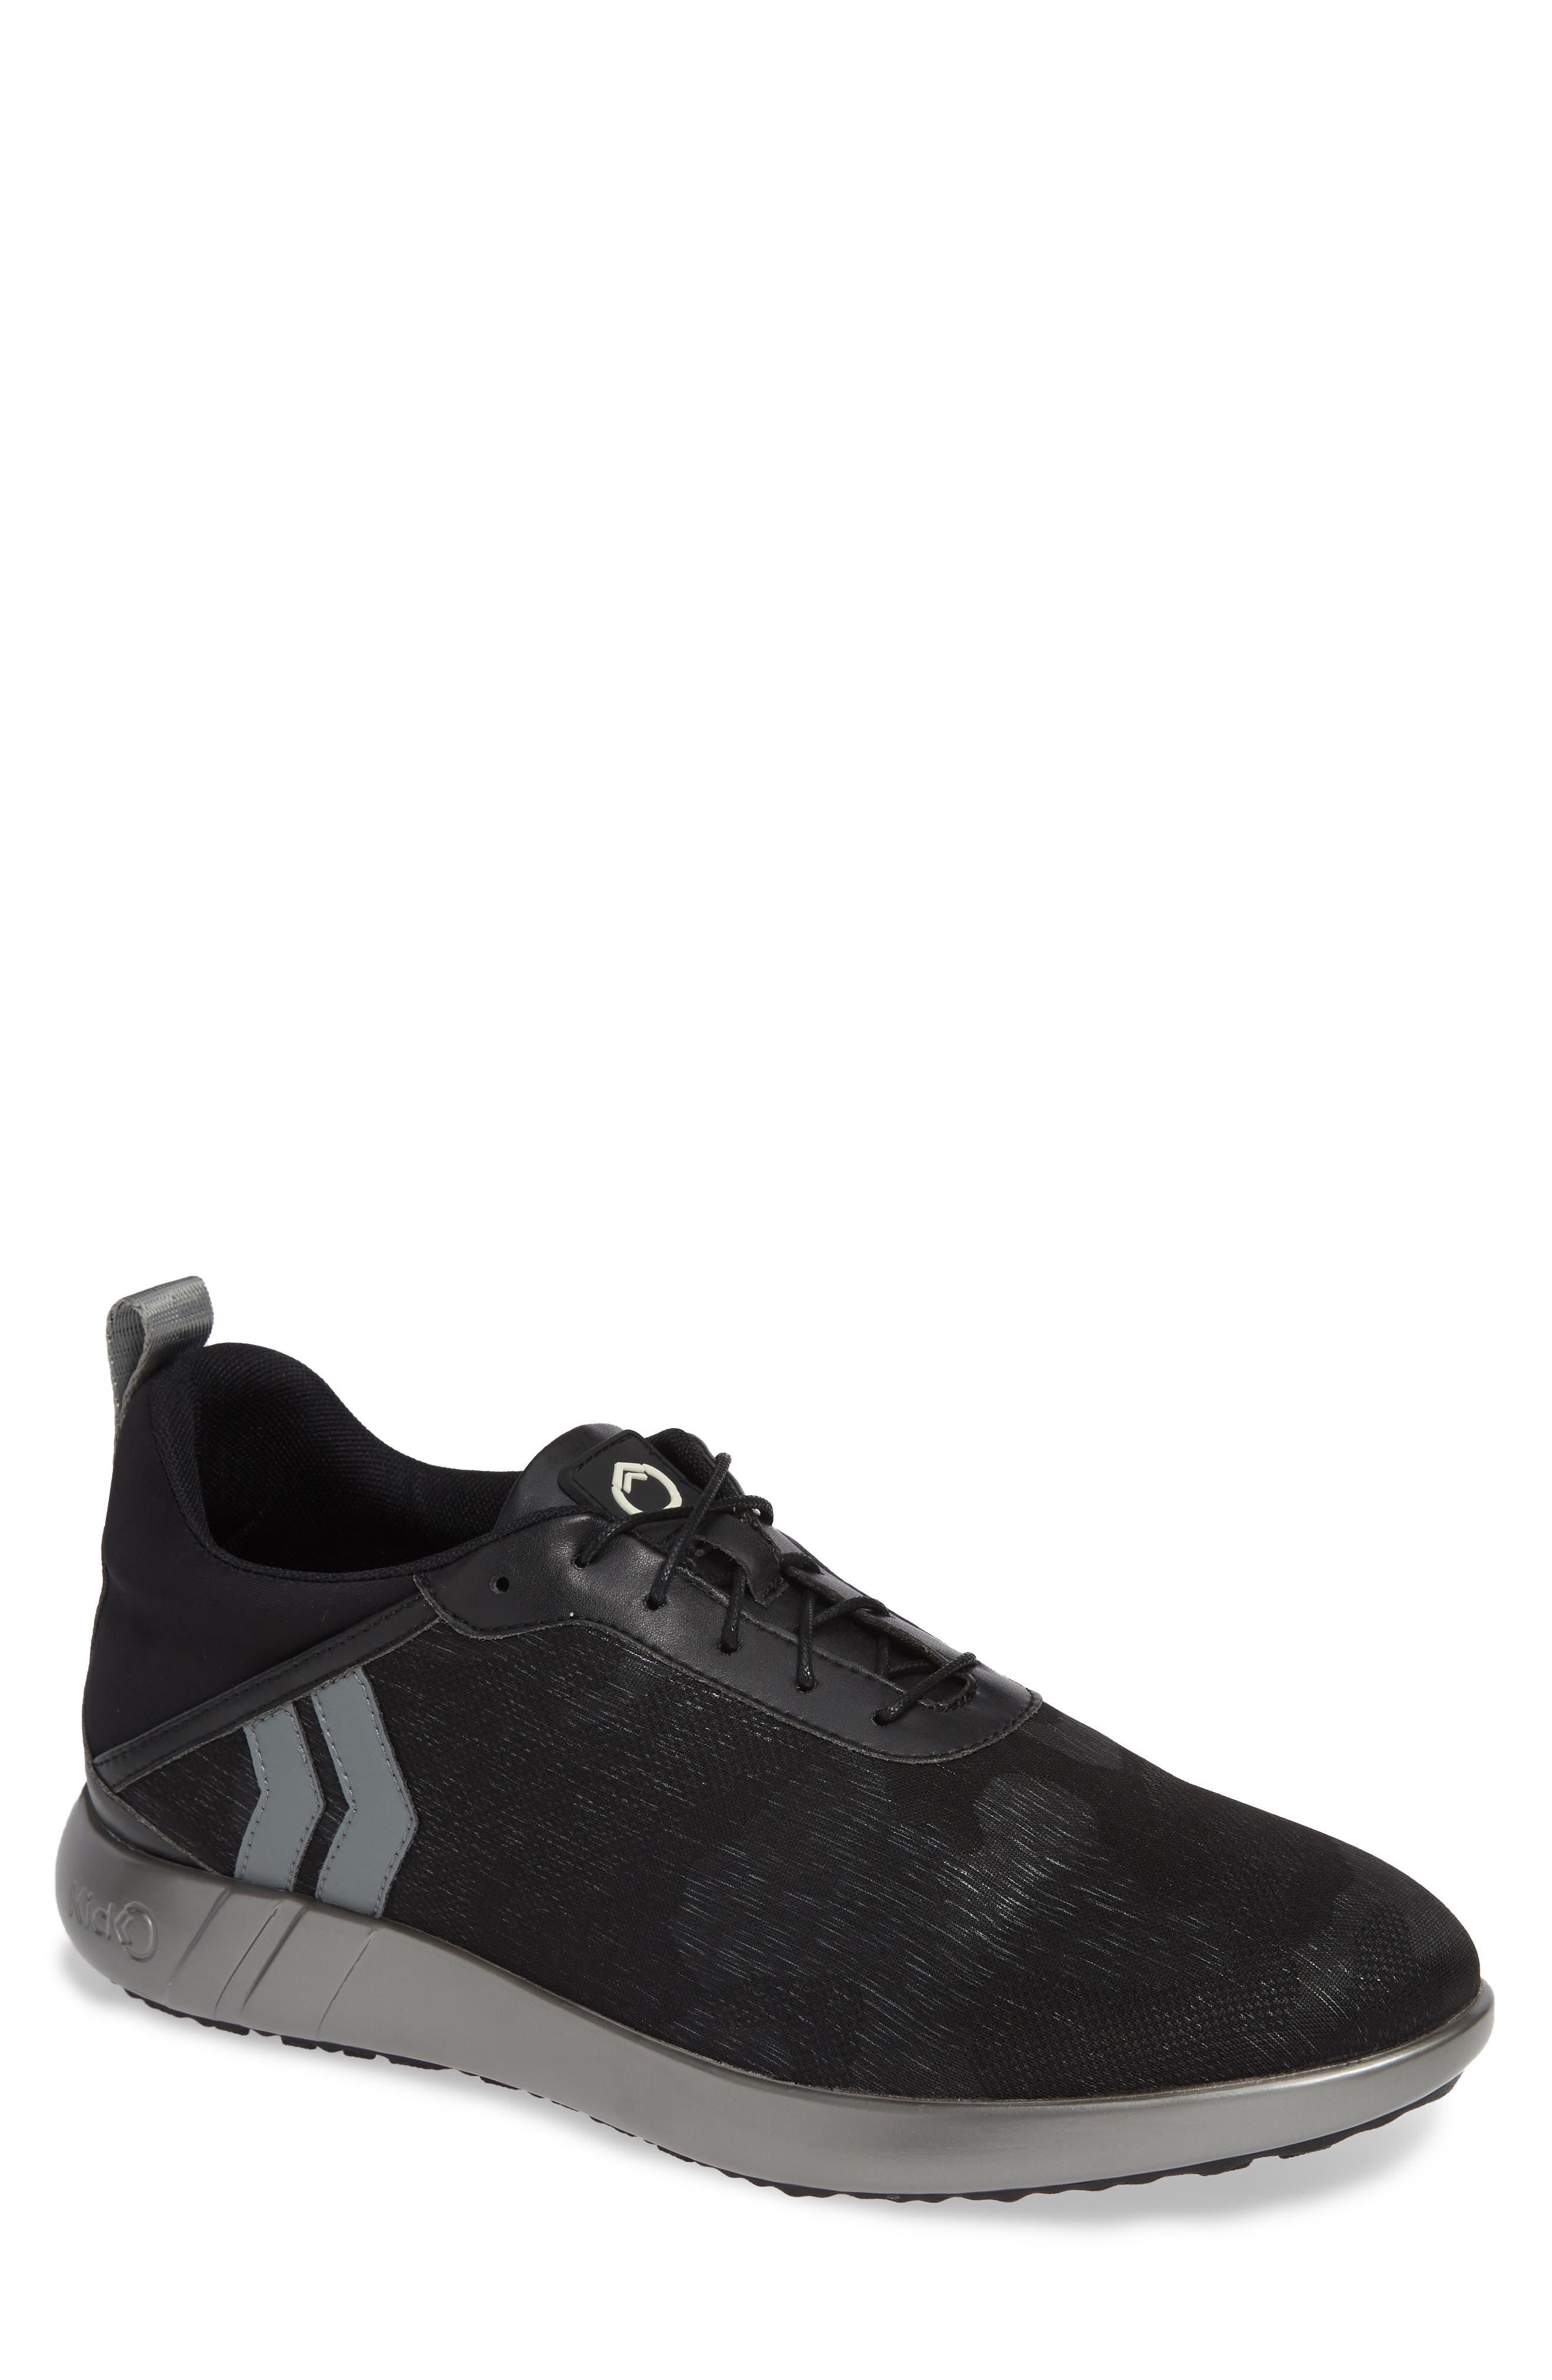 Haze Sneaker,                         Main,                         color, 021